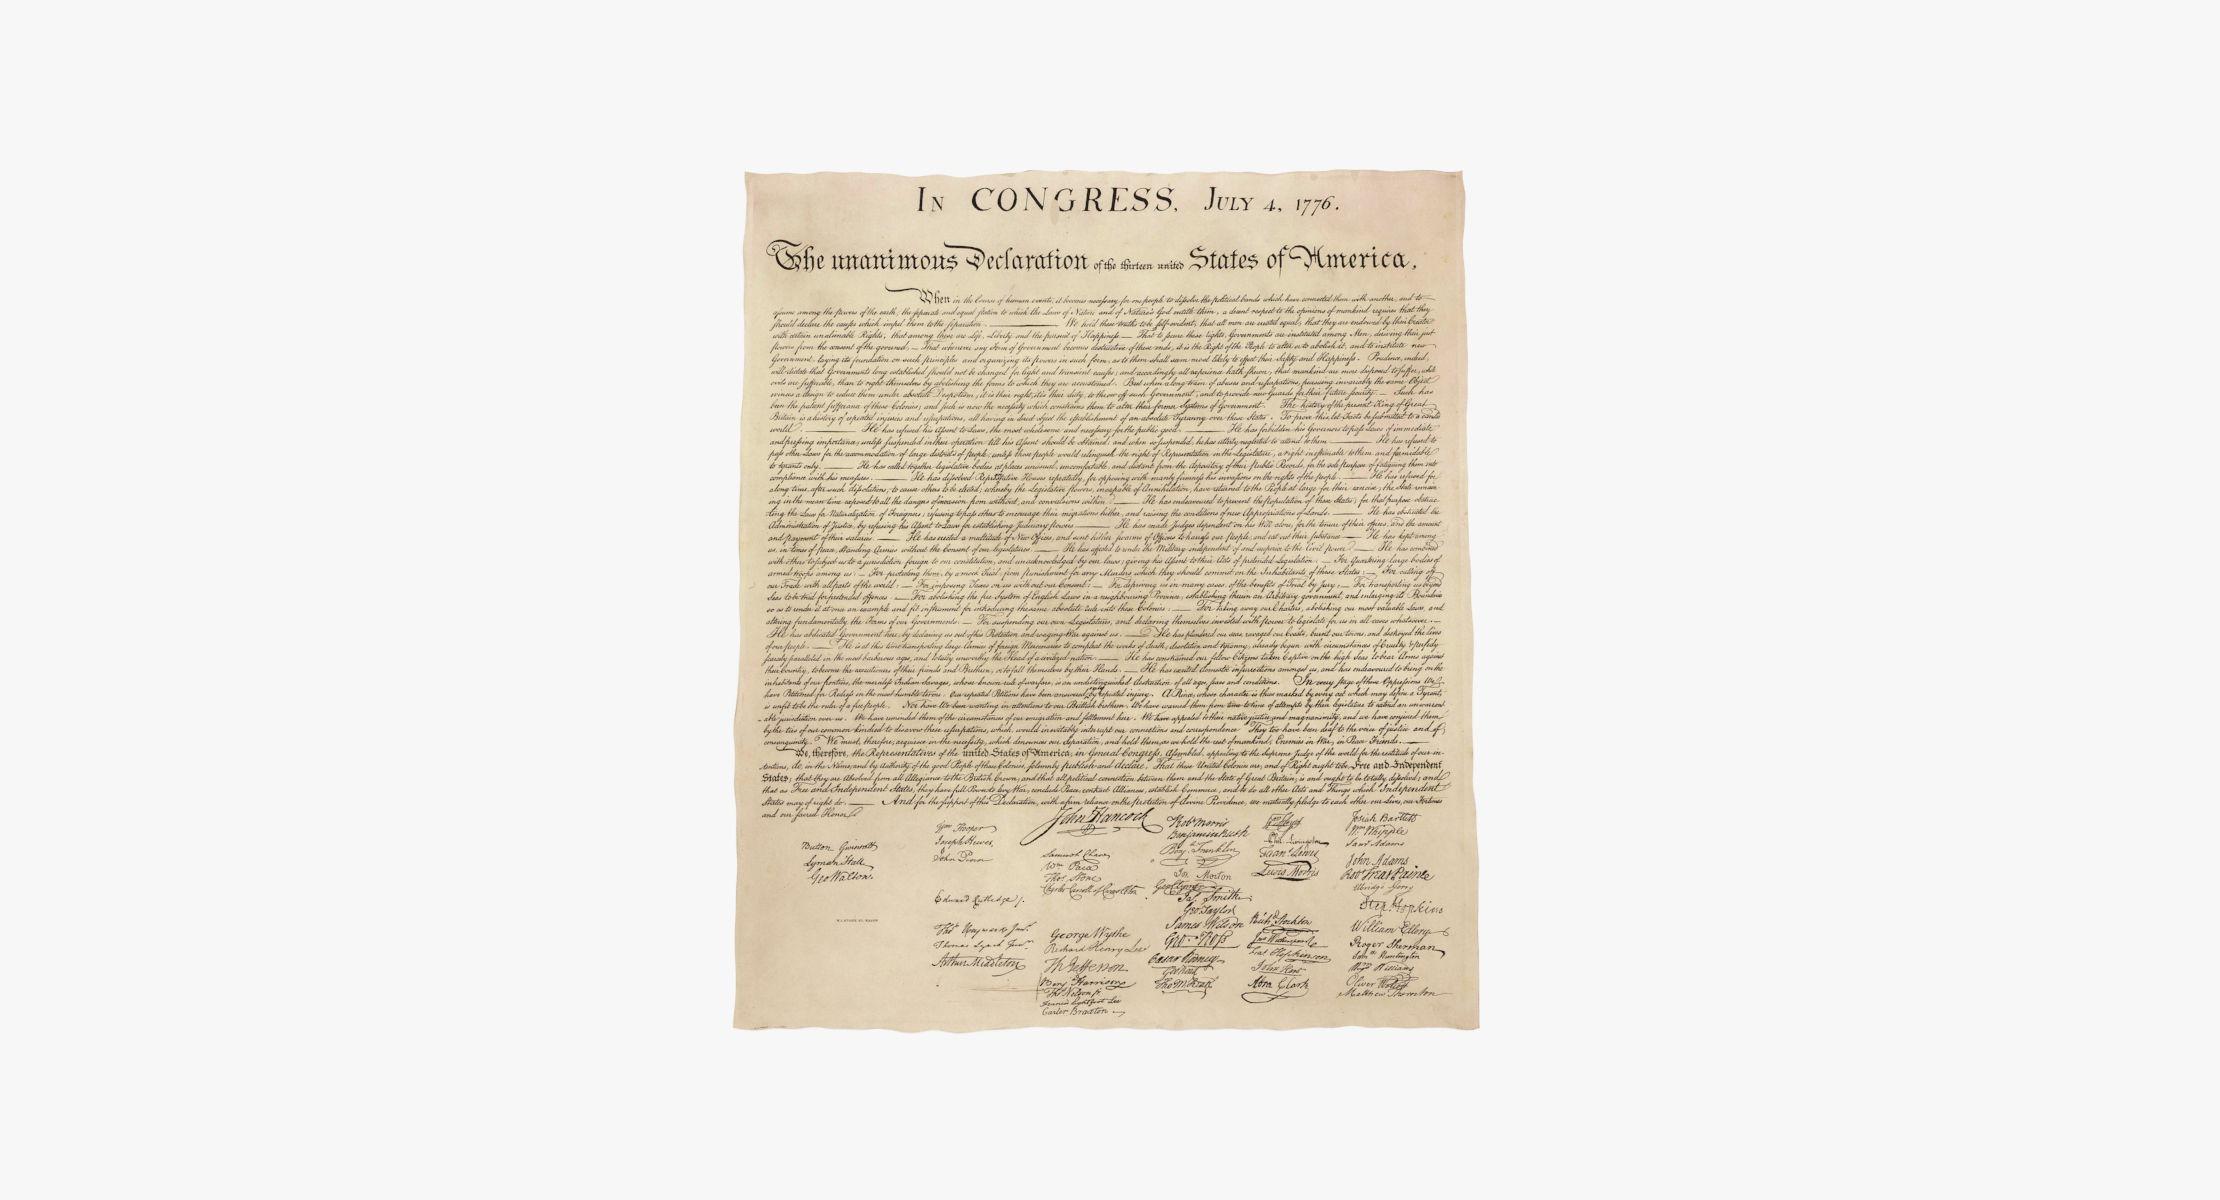 Declaration of Independence Flat - reel 1